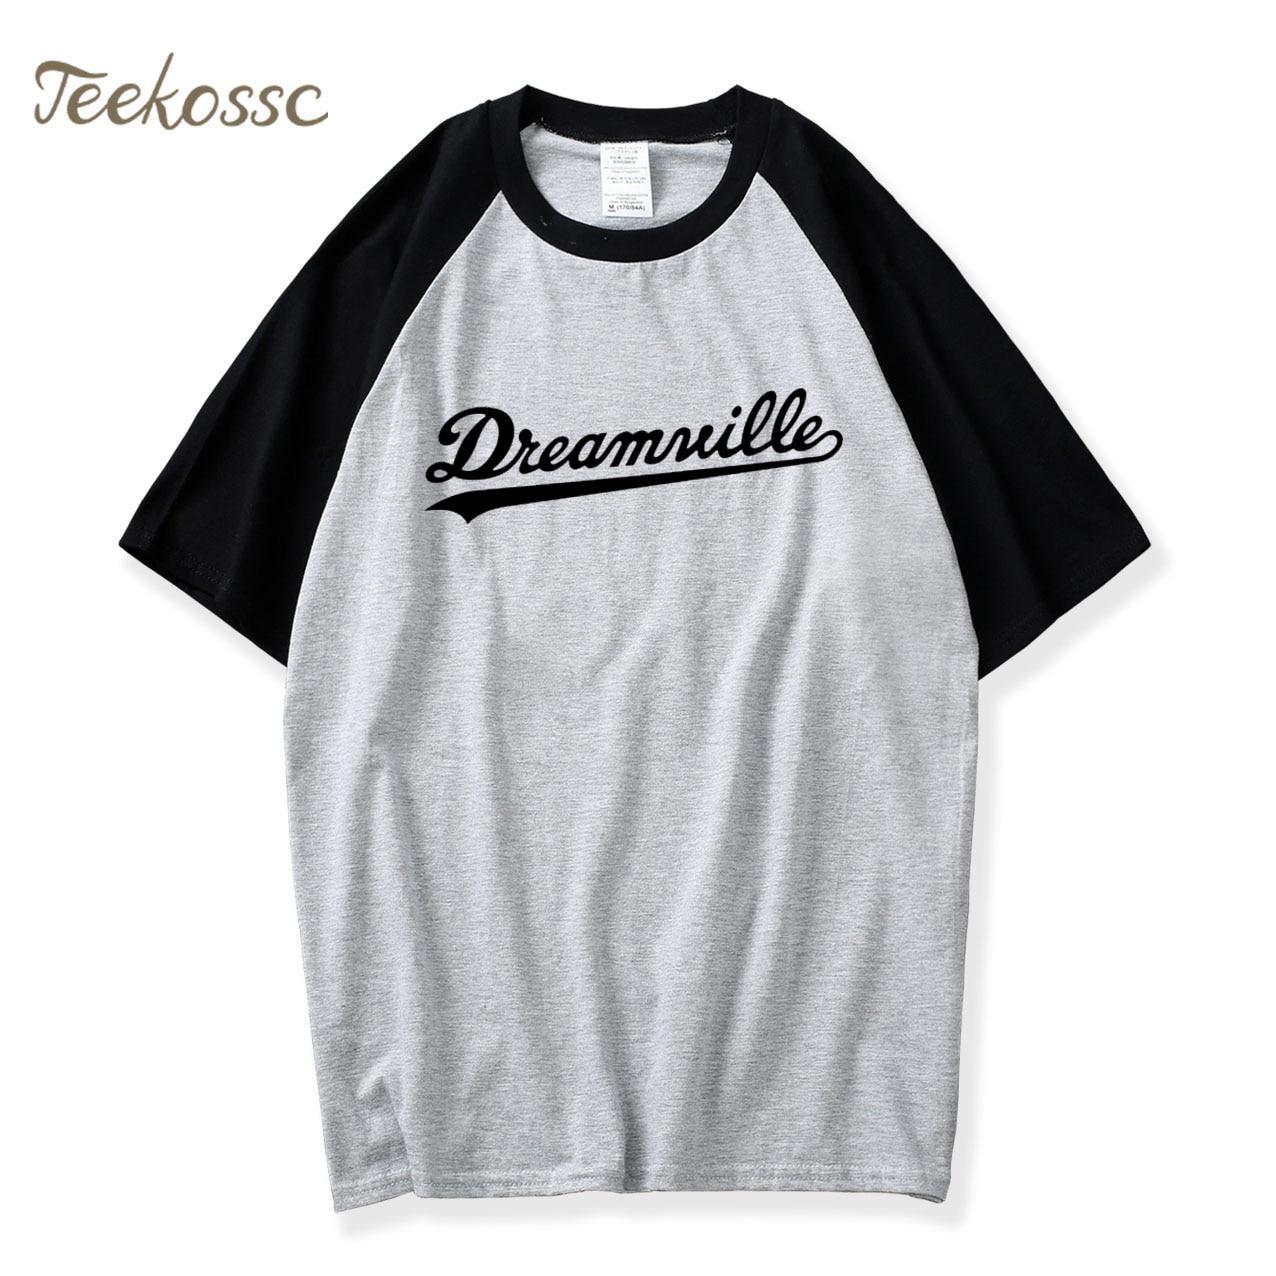 Letters Print T shirt Simple Loose Fit Casual Short Sleeve Tops Tee 2018 Hot Summer Raglan TshirtS Men 100% Cotton Men's T-Shirt